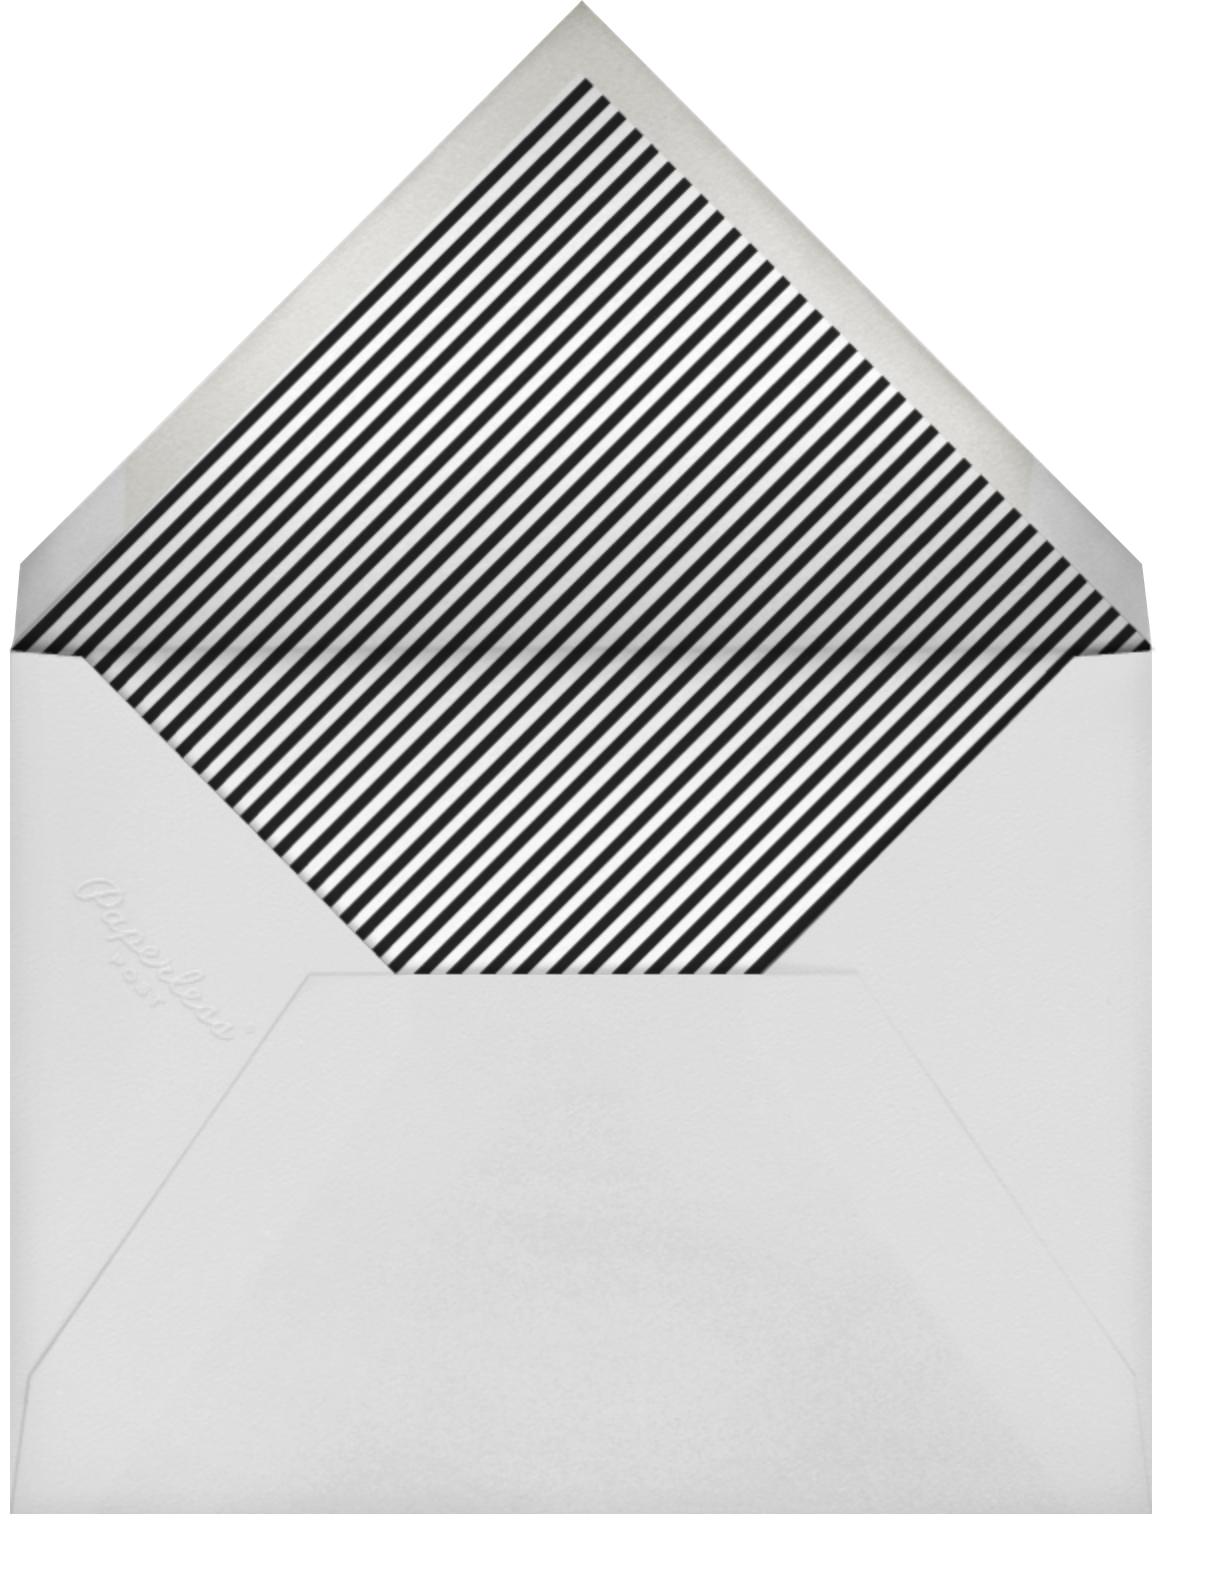 The Raleigh - Sunshine - Mr. Boddington's Studio - Envelope